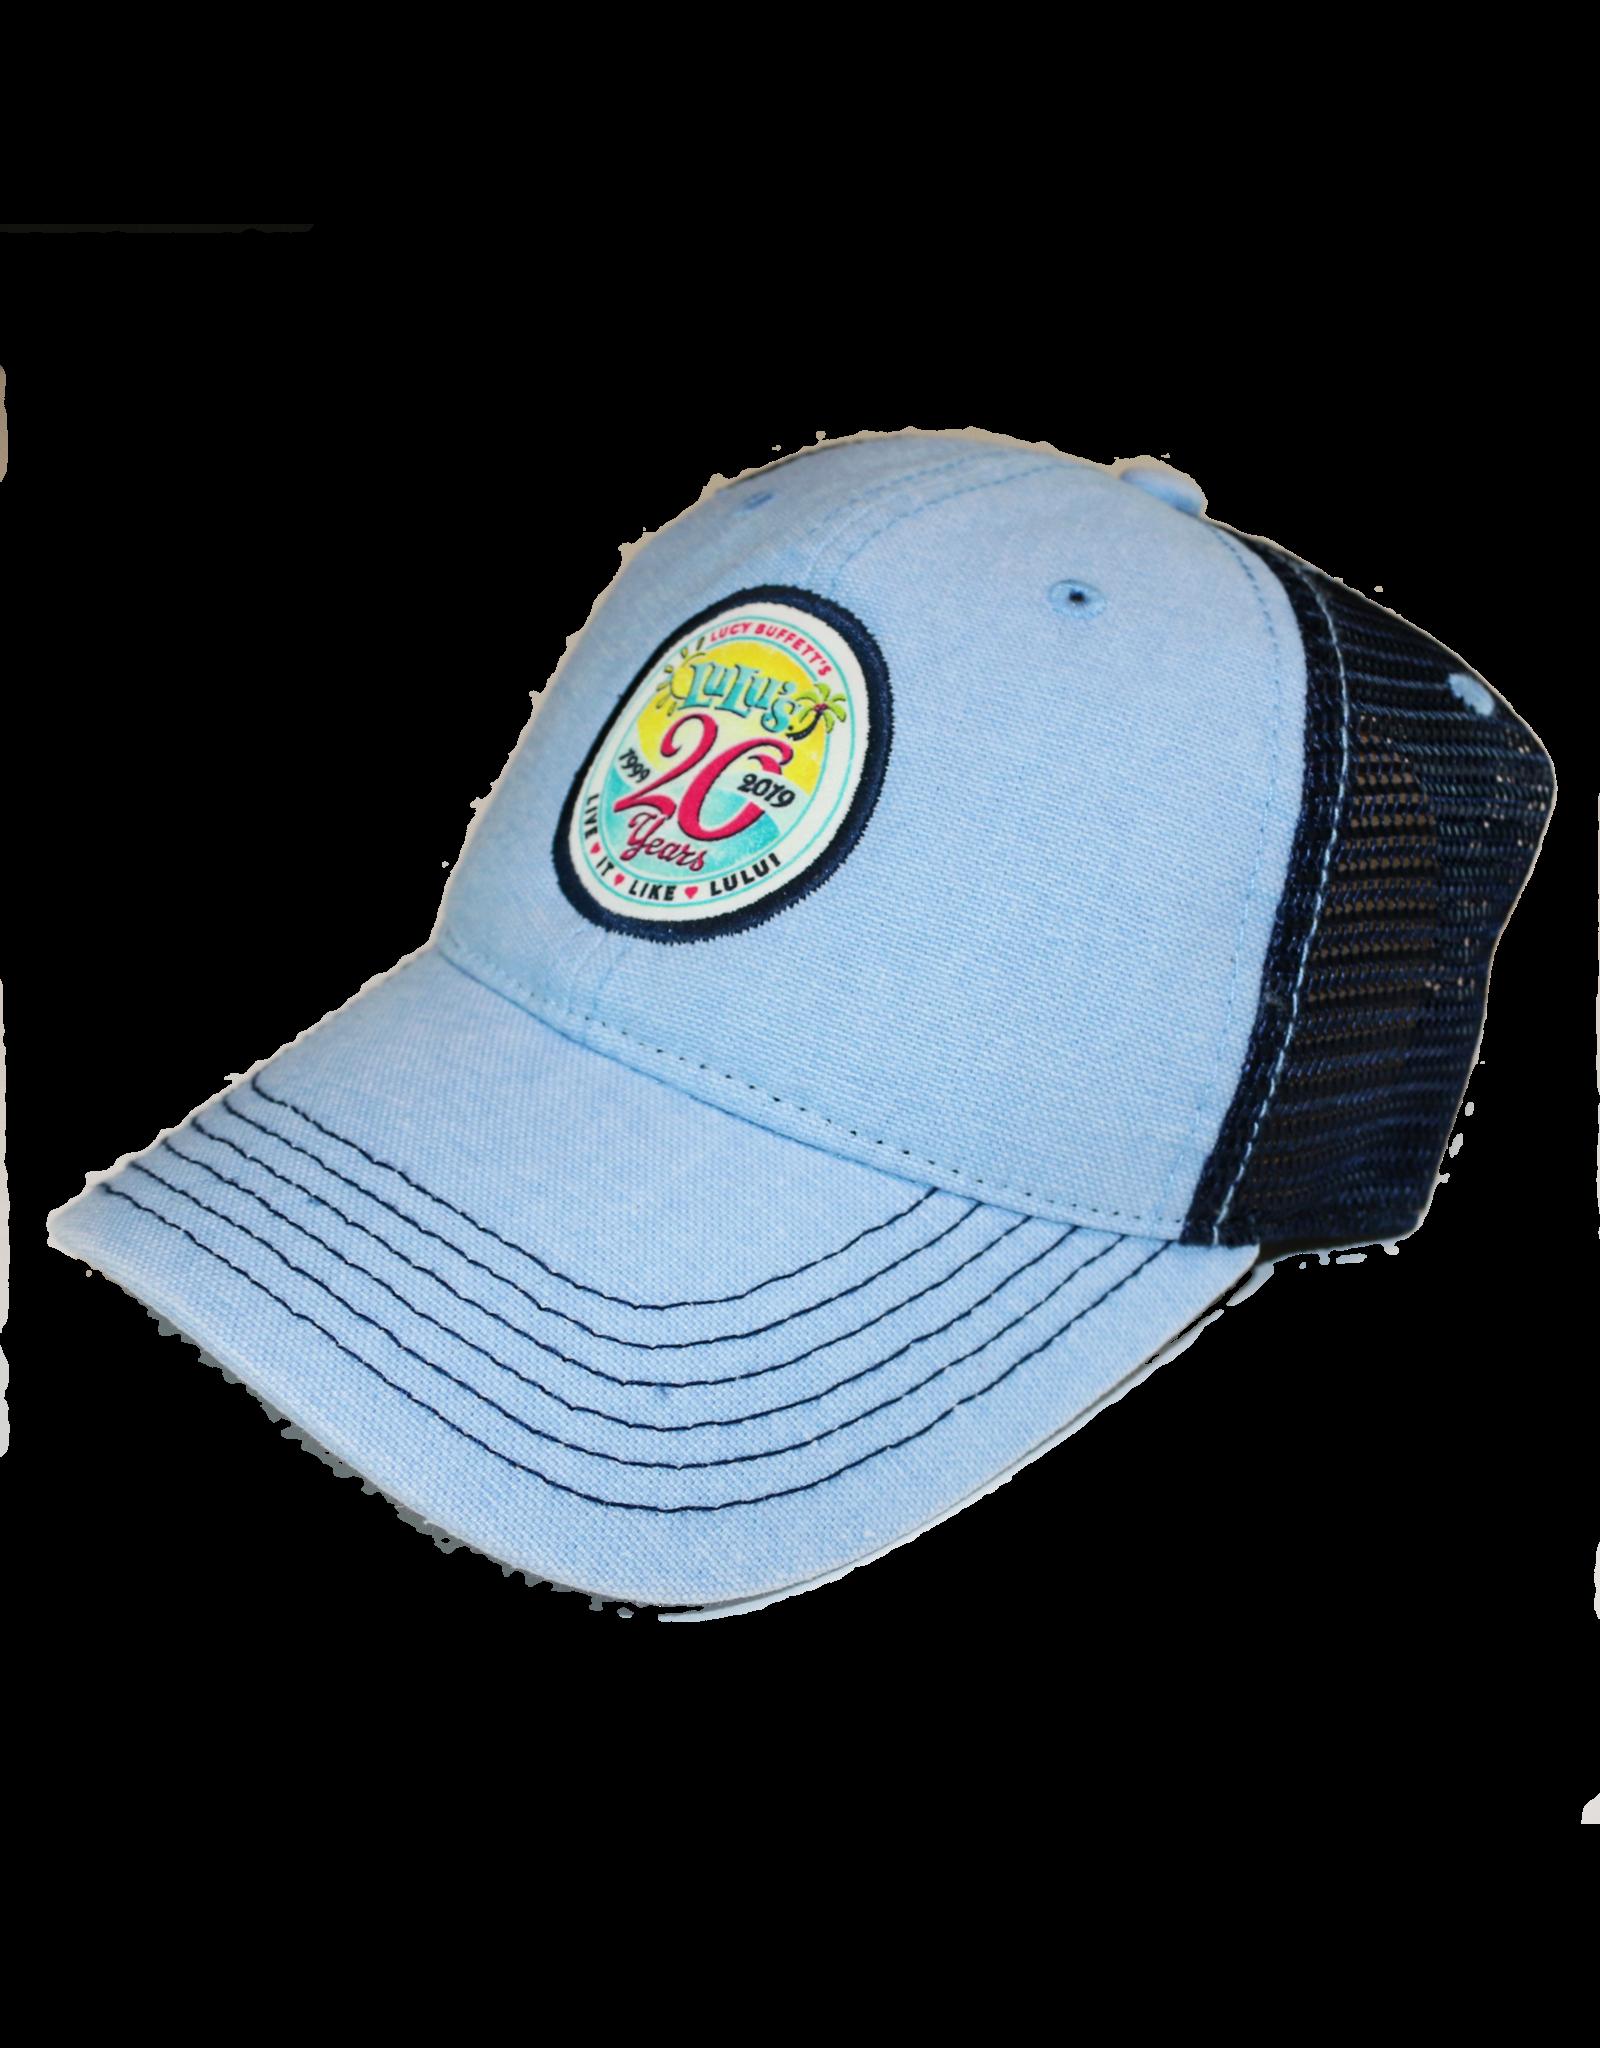 20th Anniversary Trucker Hat